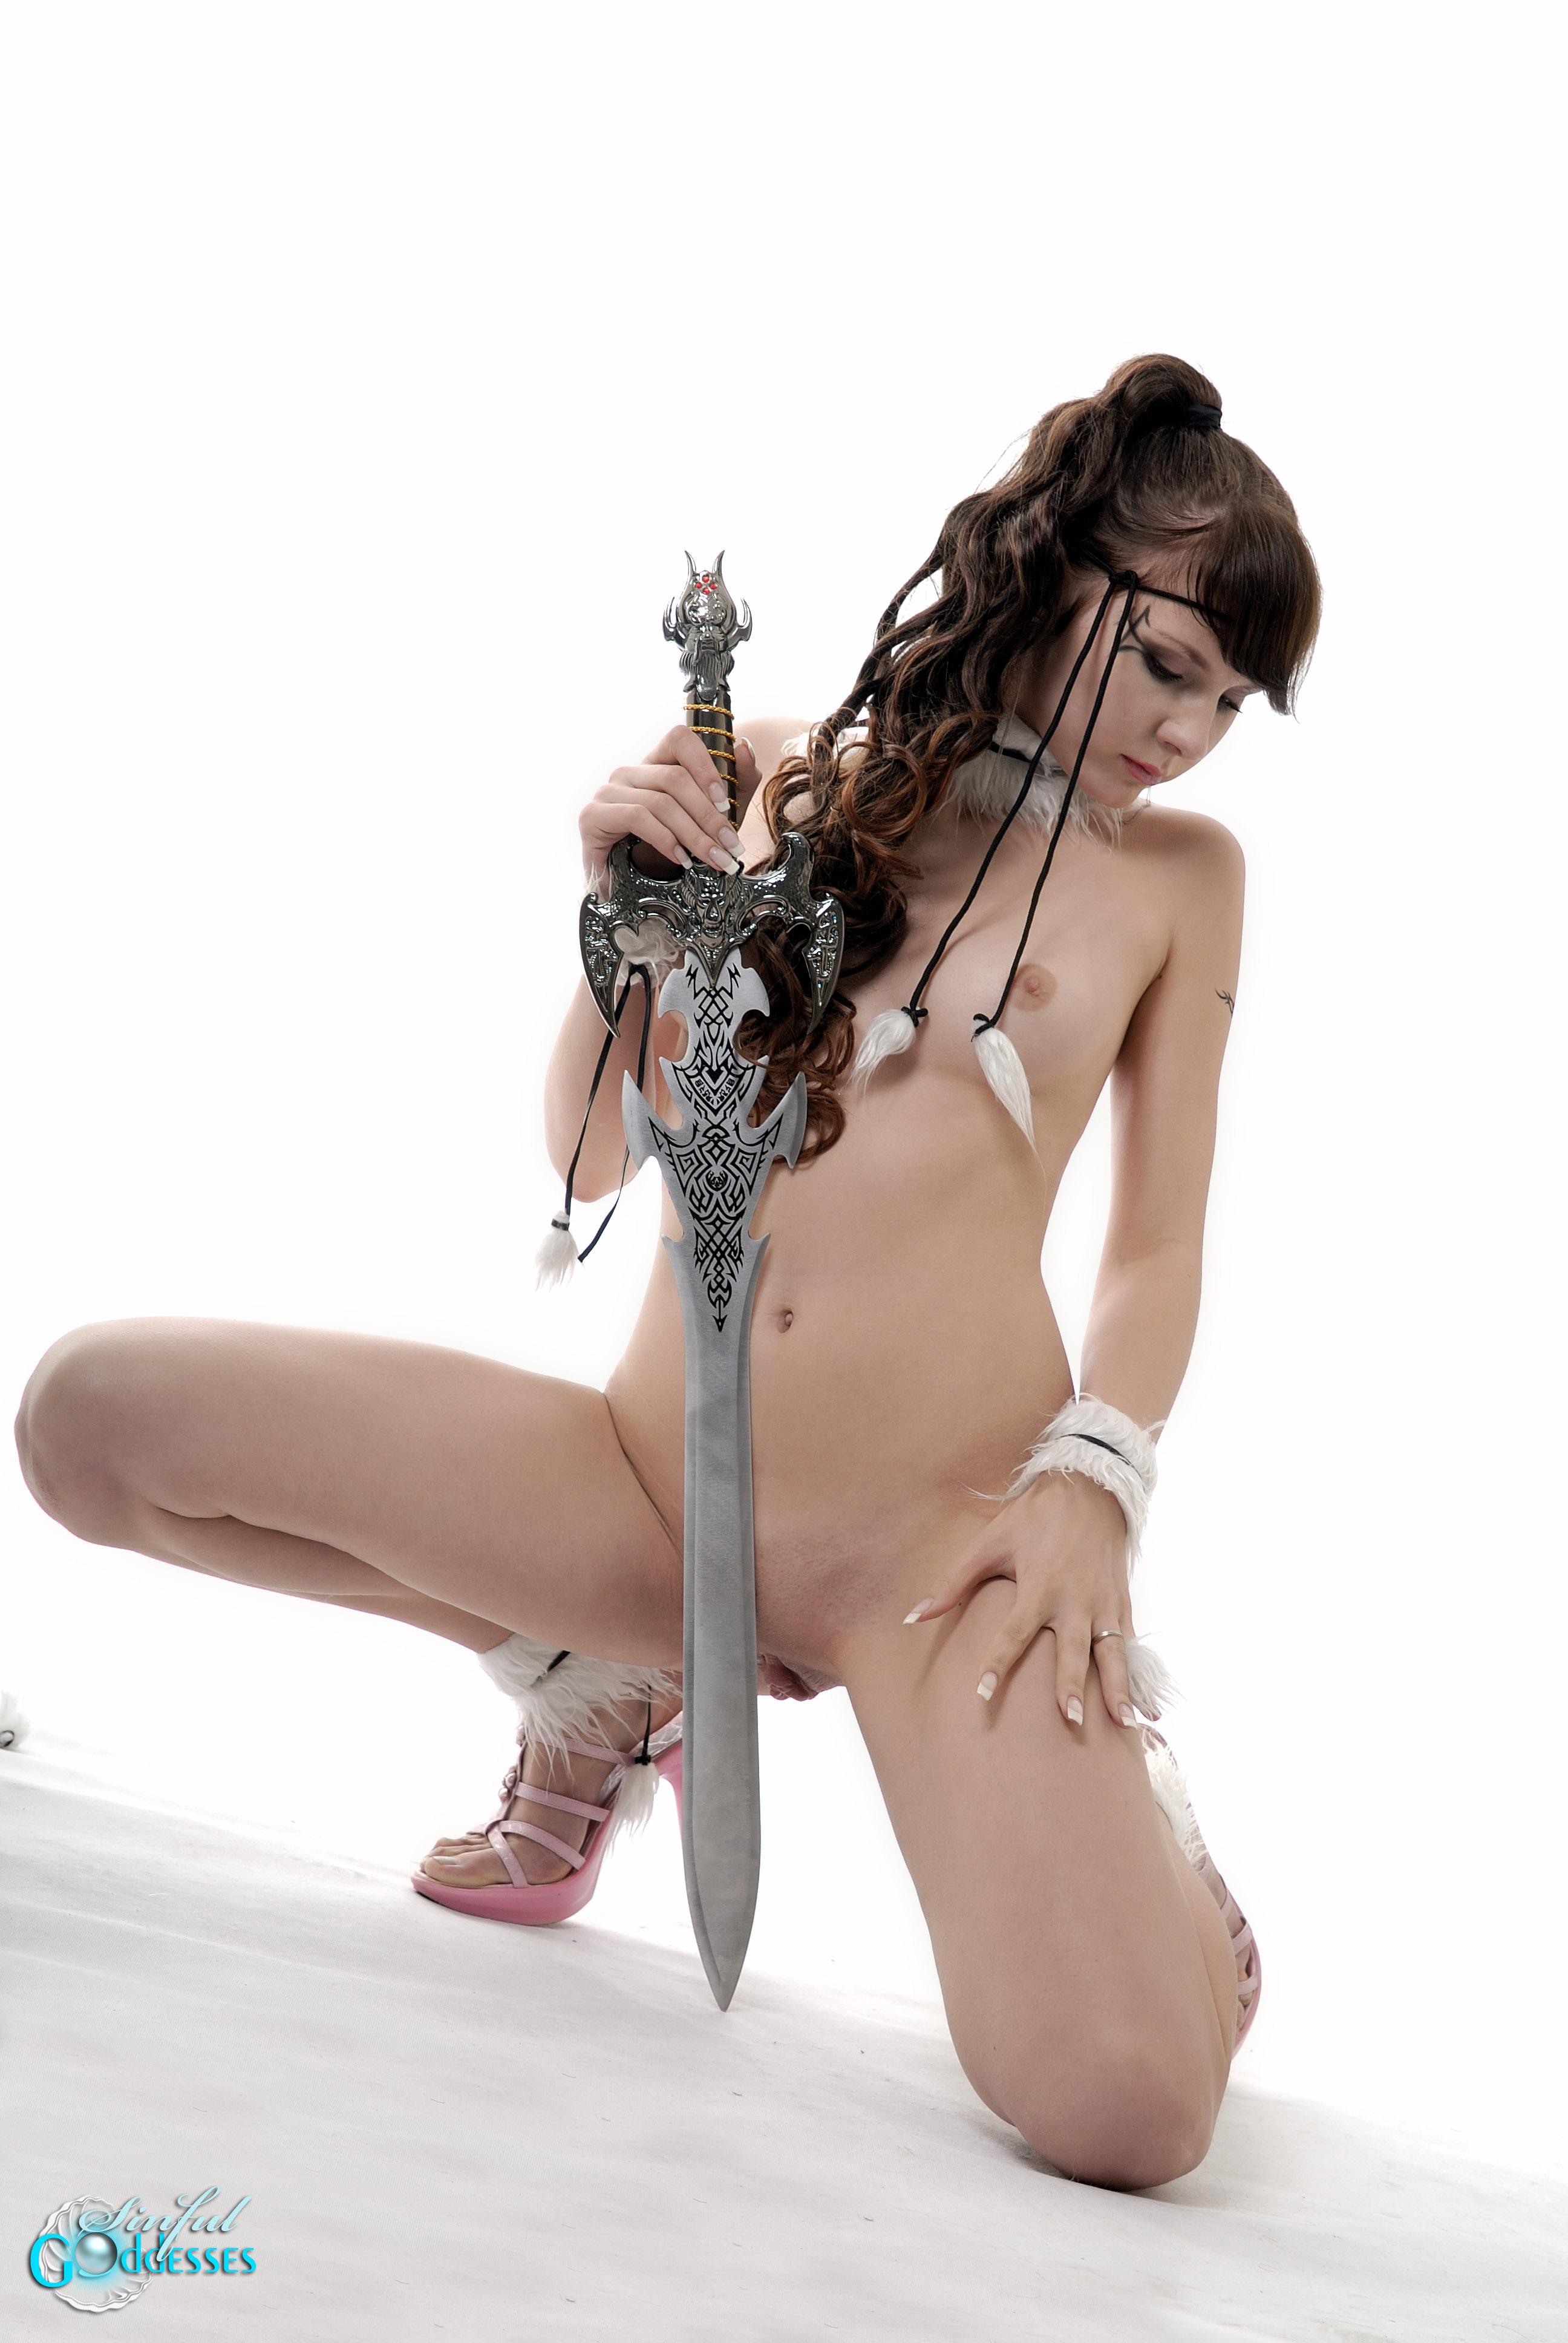 Фото девушка с мечом эротика 8 фотография